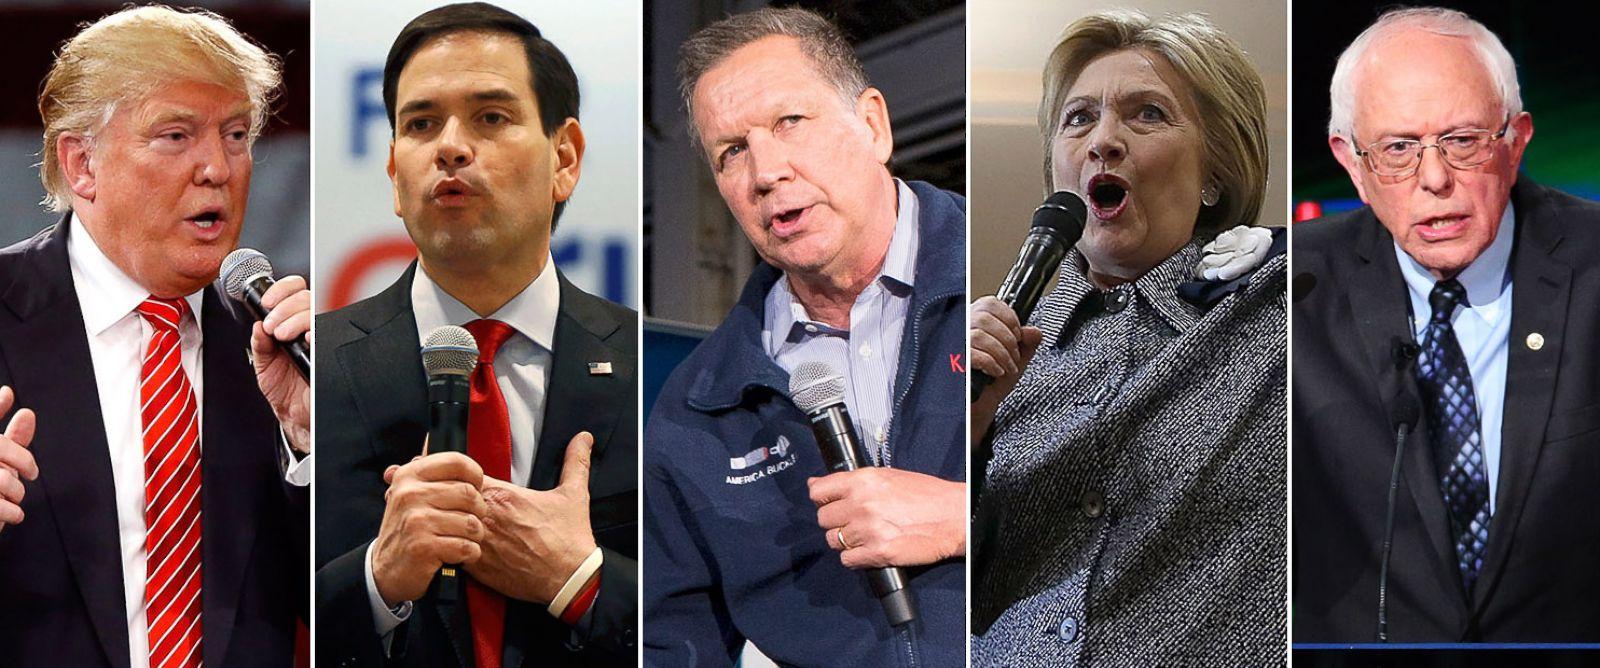 PHOTO: Donald Trump, Marco Rubio, John Kasich, Hillary Clinton and Bernie Sanders campaign for president.